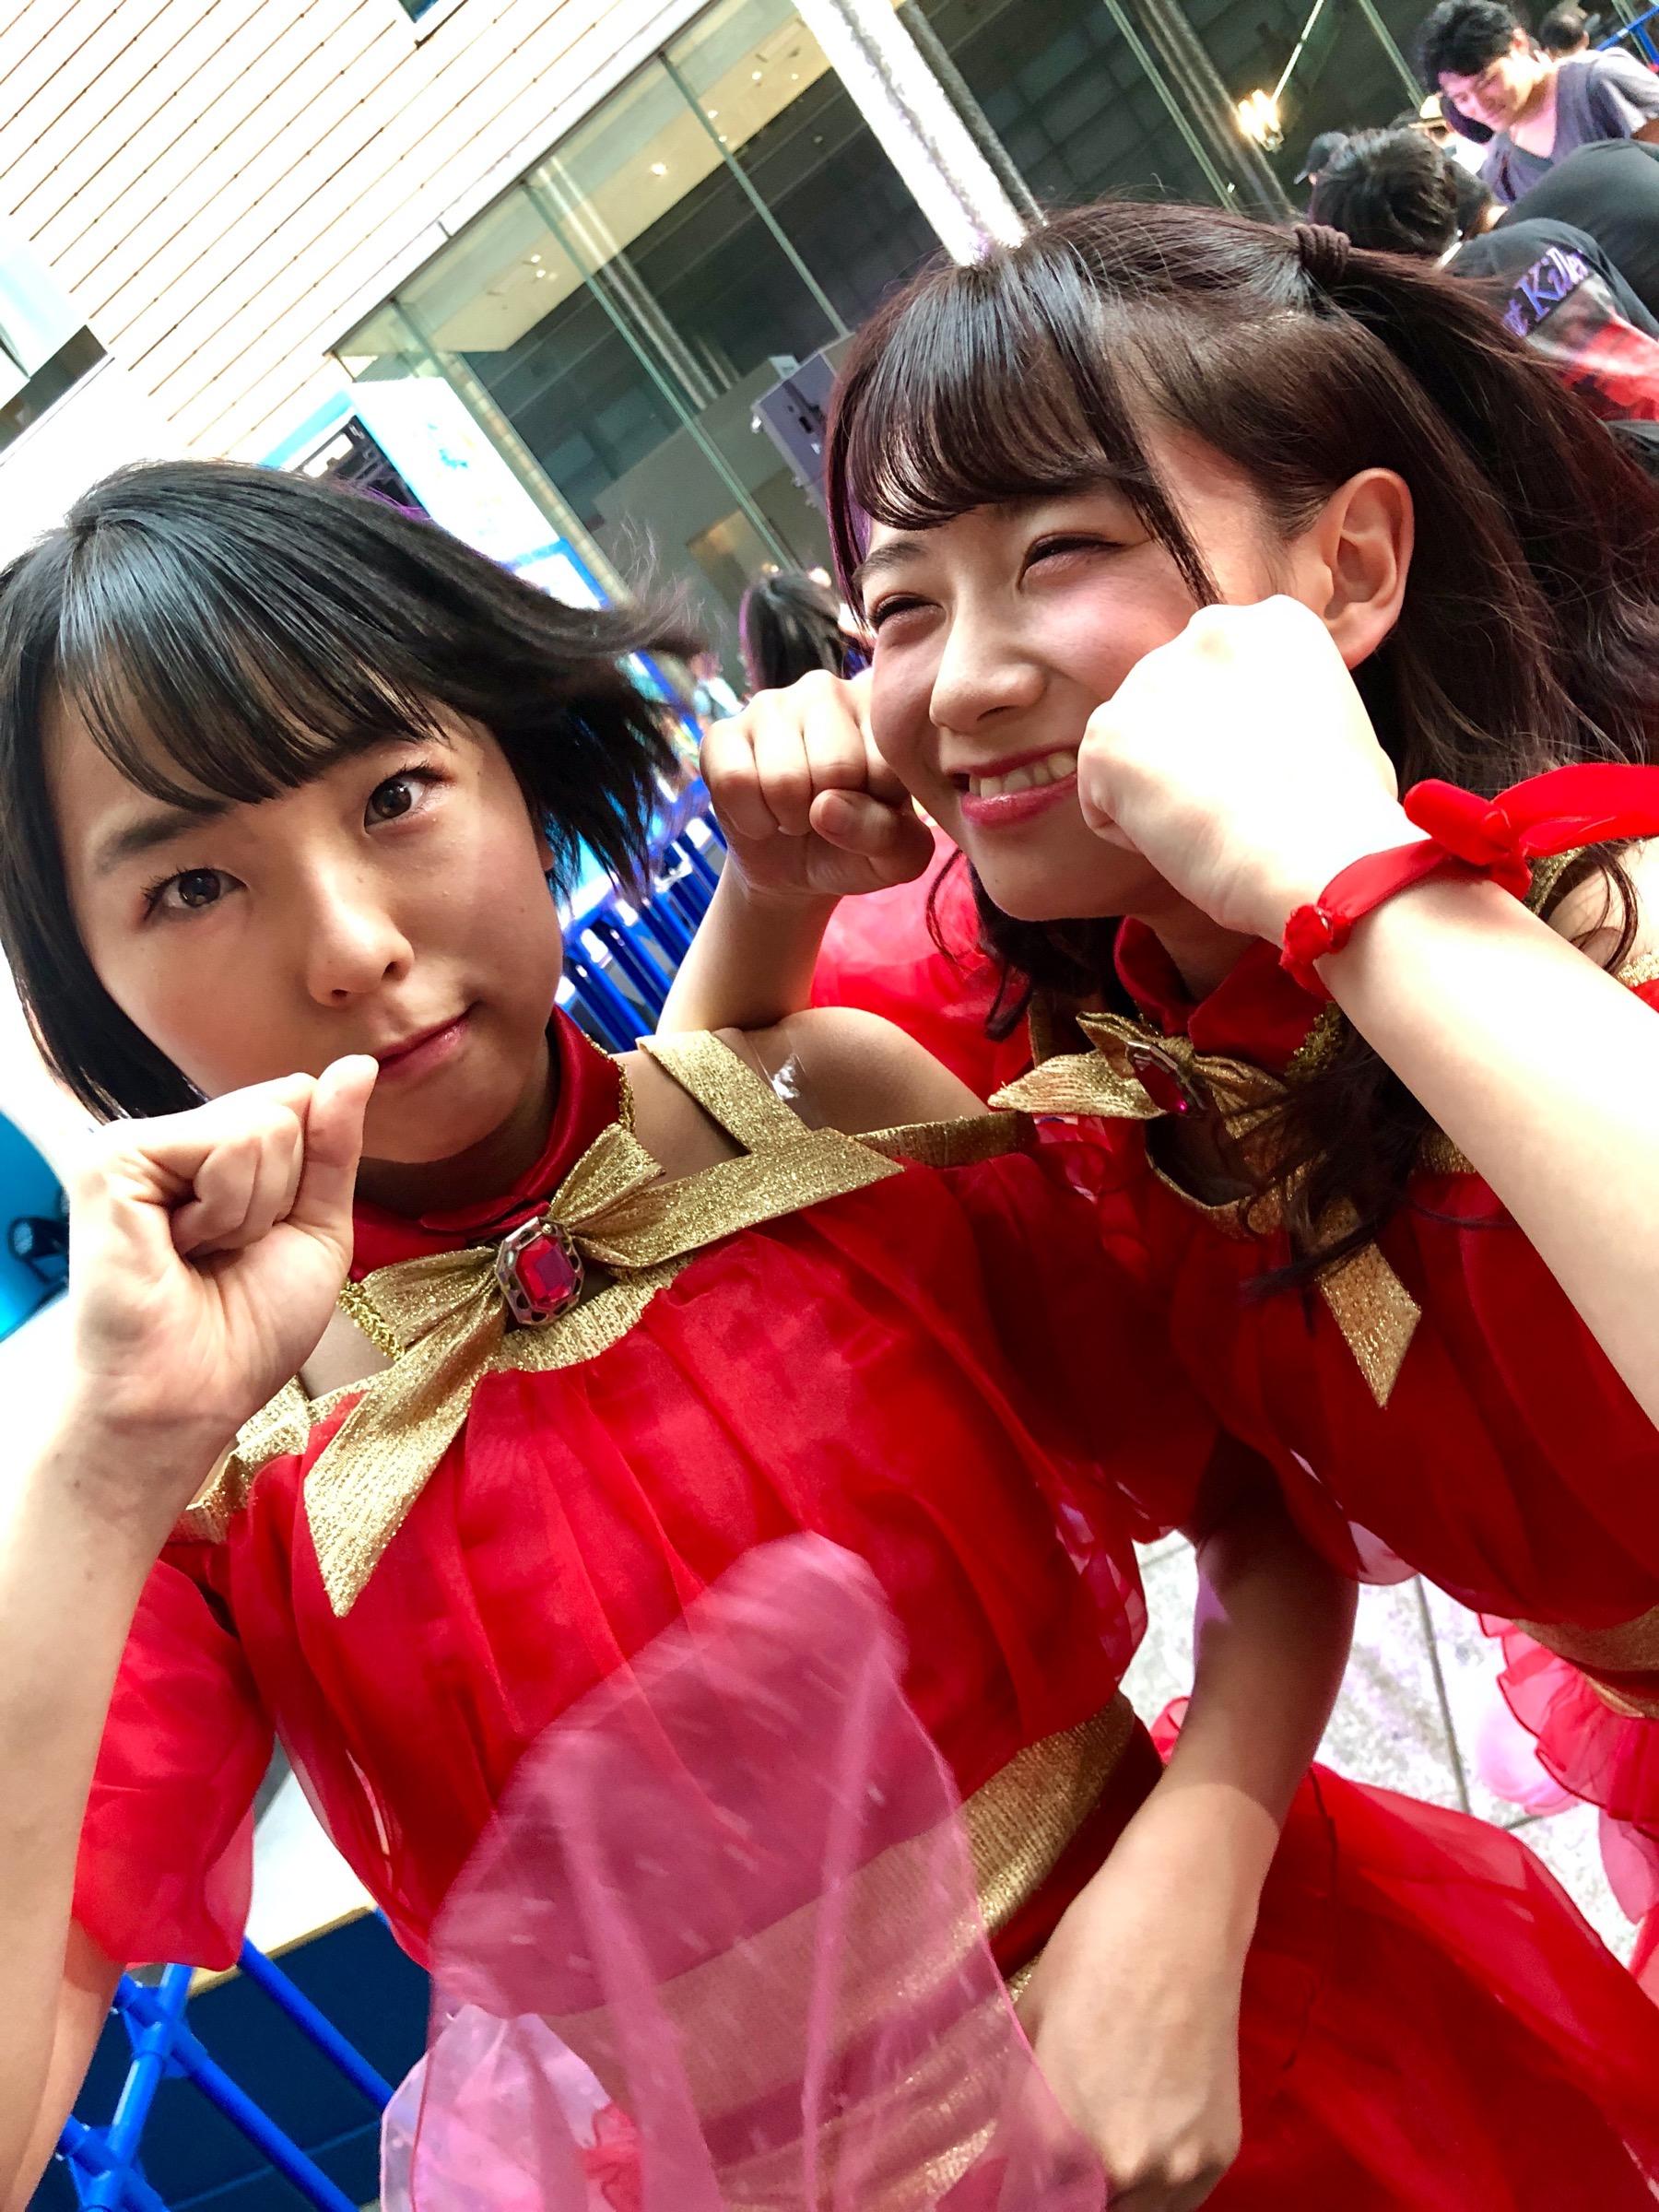 Aya Kajishima and Chinatsu Takahagi from Up Up Girls(2)